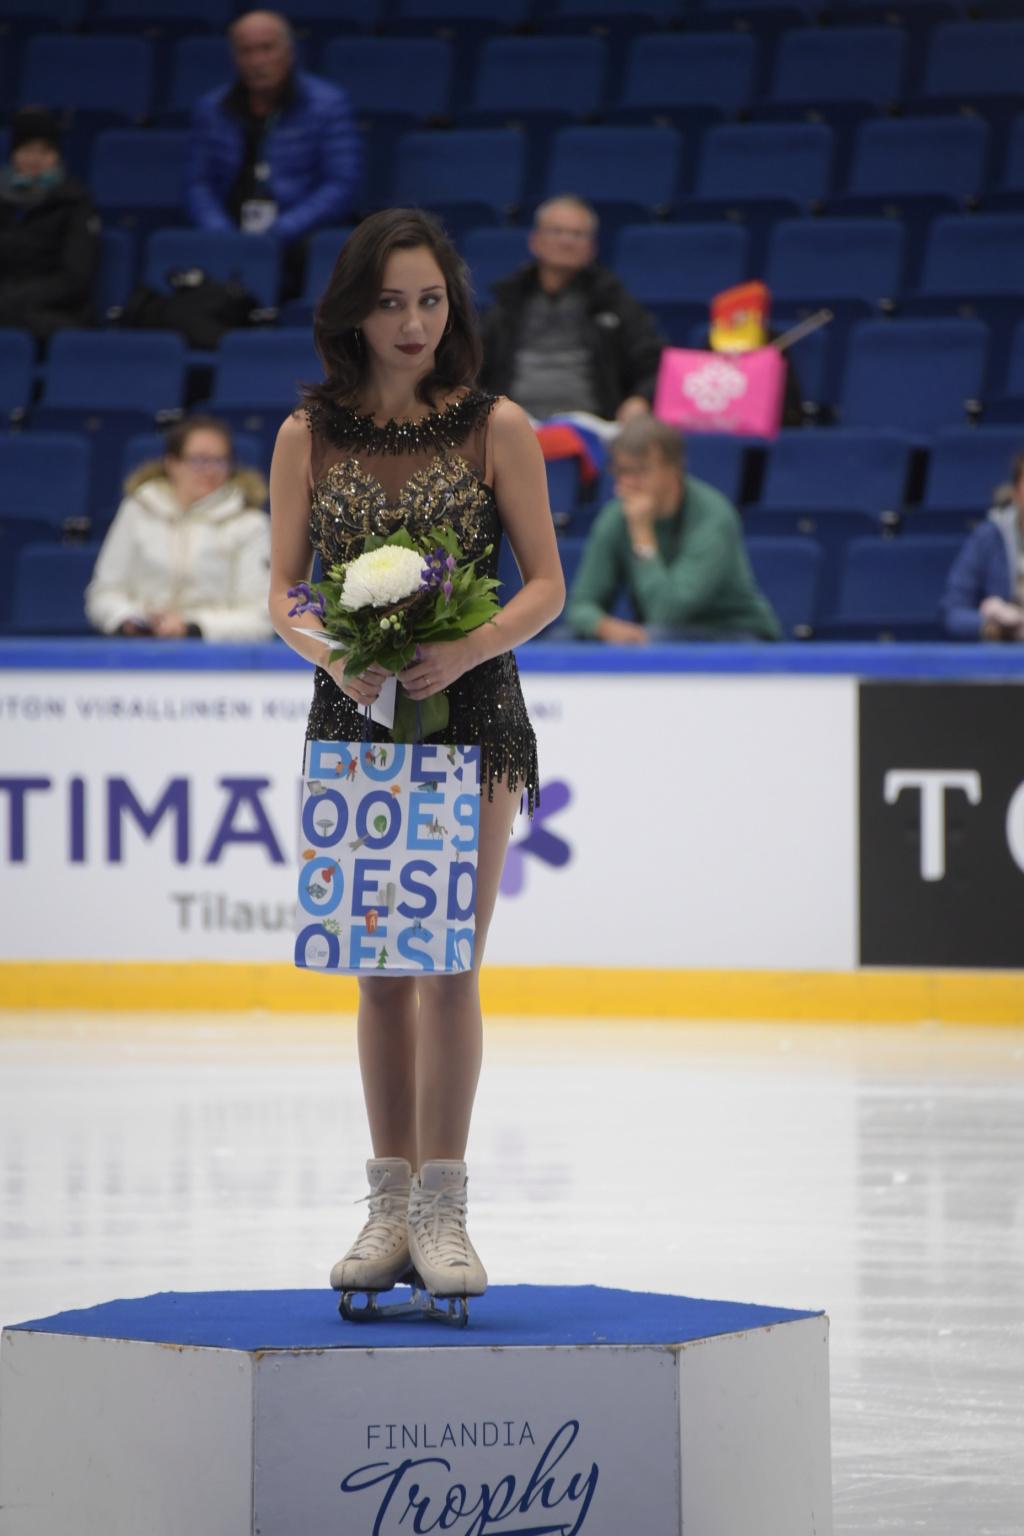 Challenger (7) - Finlandia Trophy Espoo. 04 - 07 Oct 2017 Espoo / FIN - Страница 23 15389310